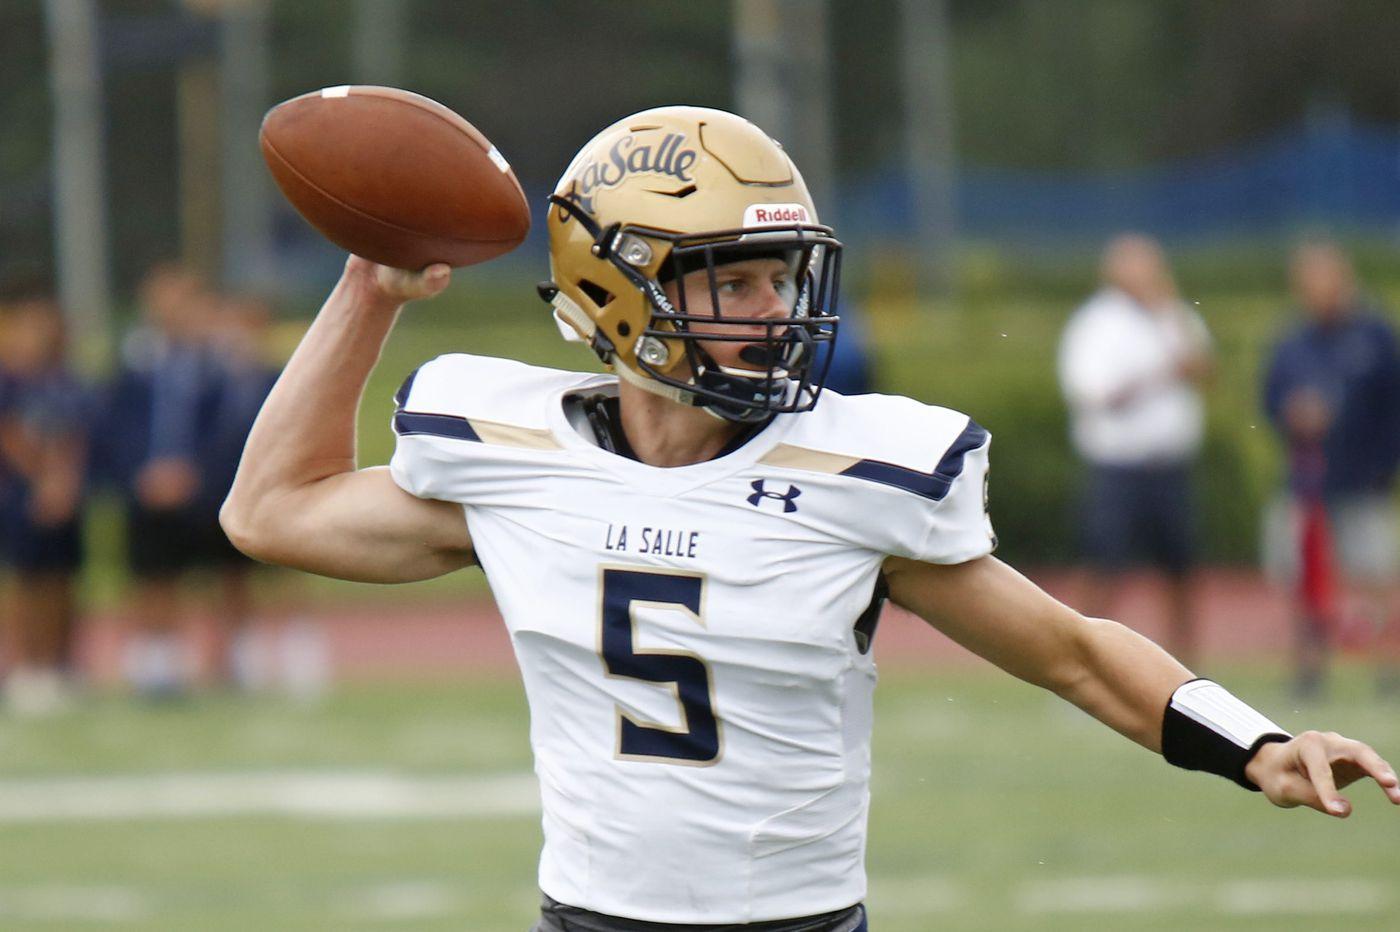 High school football preview: La Salle to battle No. 1-ranked St. Joe's Prep